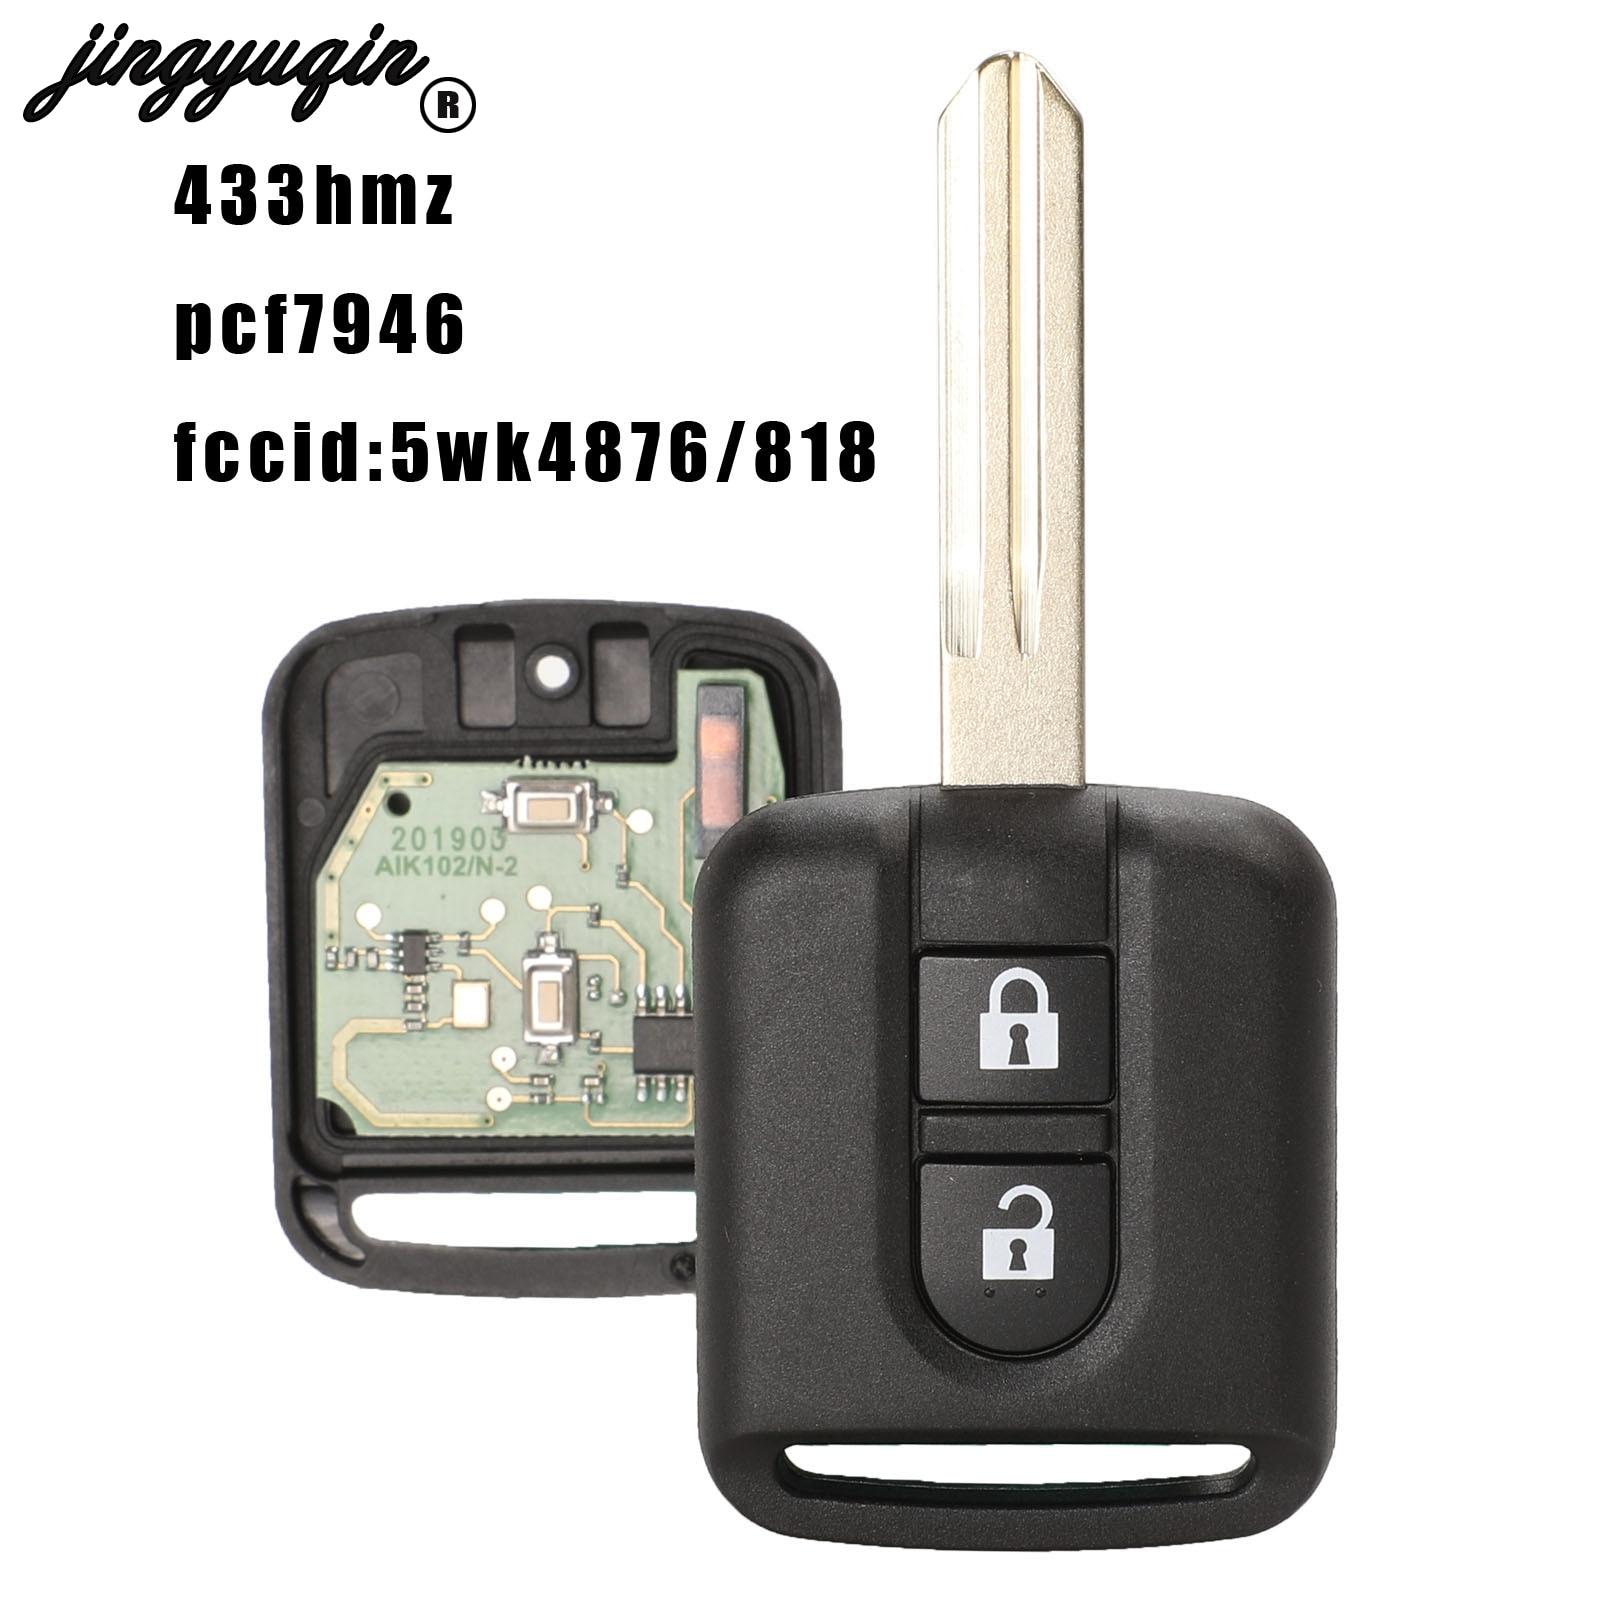 Fits Nissan Transponder Square Remote Key Fob /& NSN14 Blade repair case shell